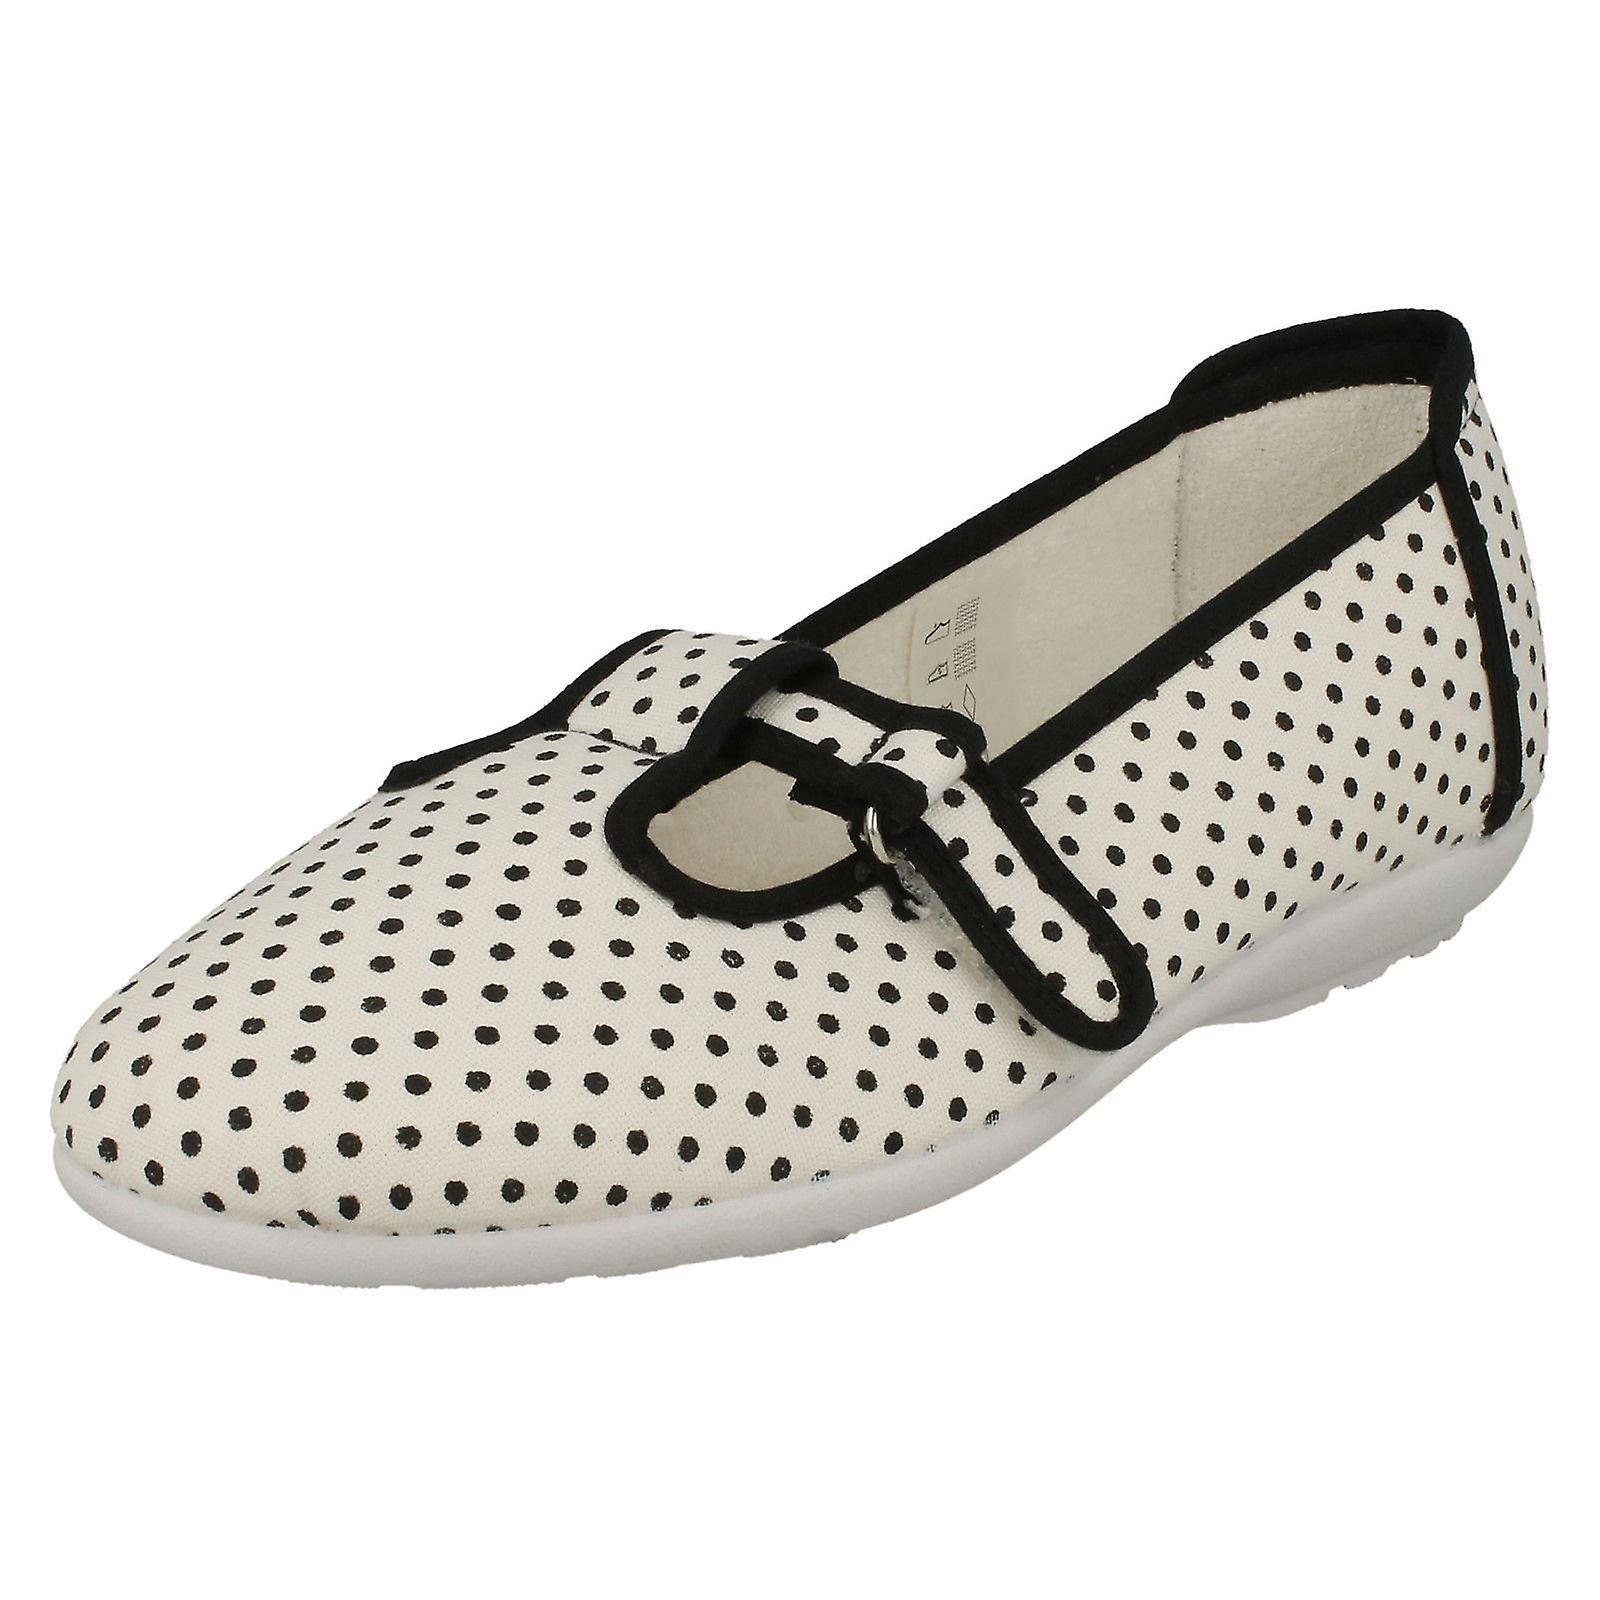 646331a9a45 Ladies Easy B T-Bar Canvas Shoes Dots - White Polka Dot Canvas - UK ...